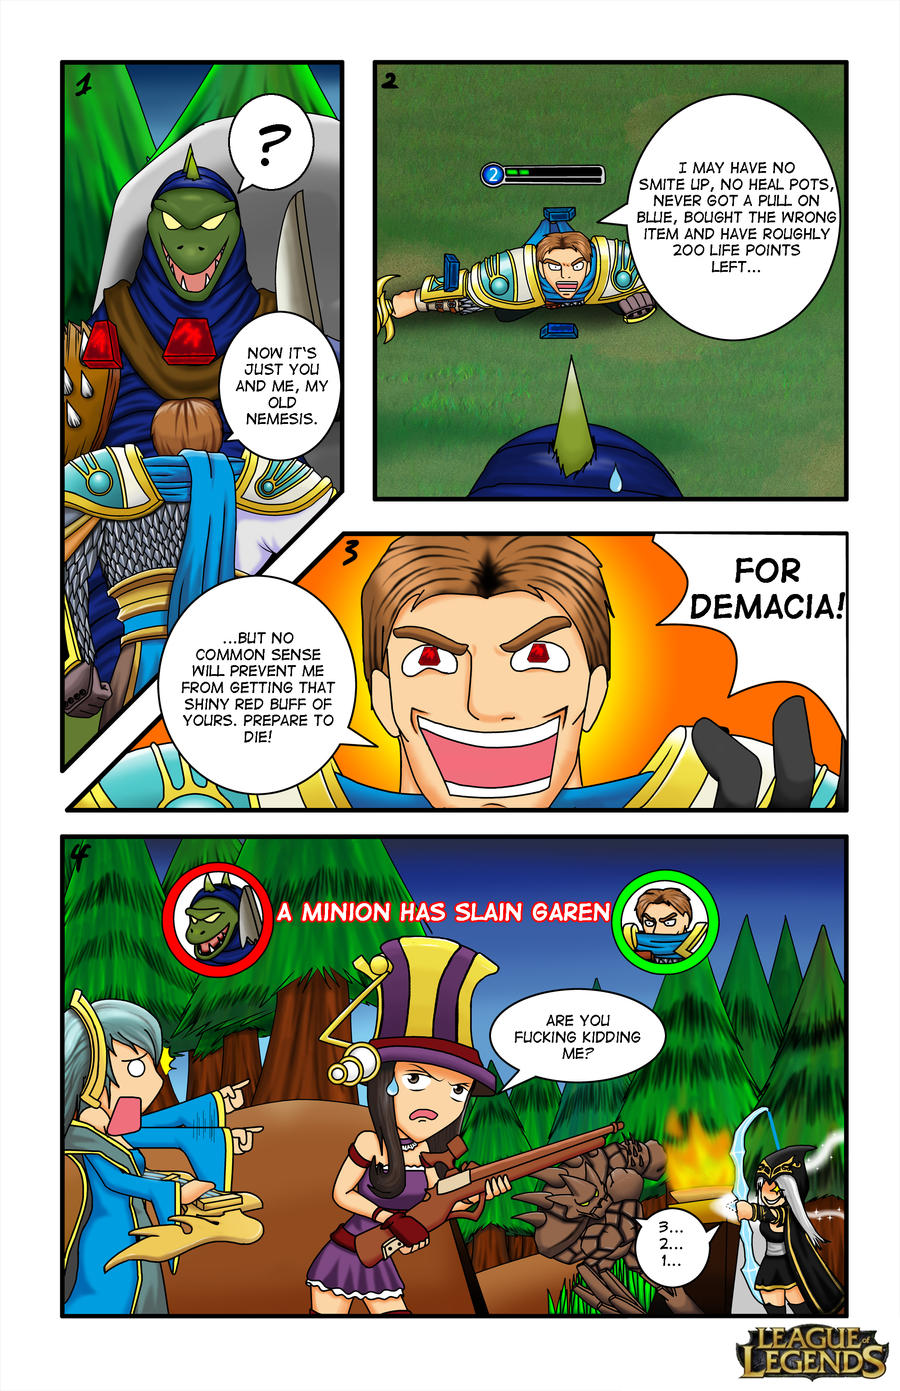 Lol comic by Liubei-Xuande